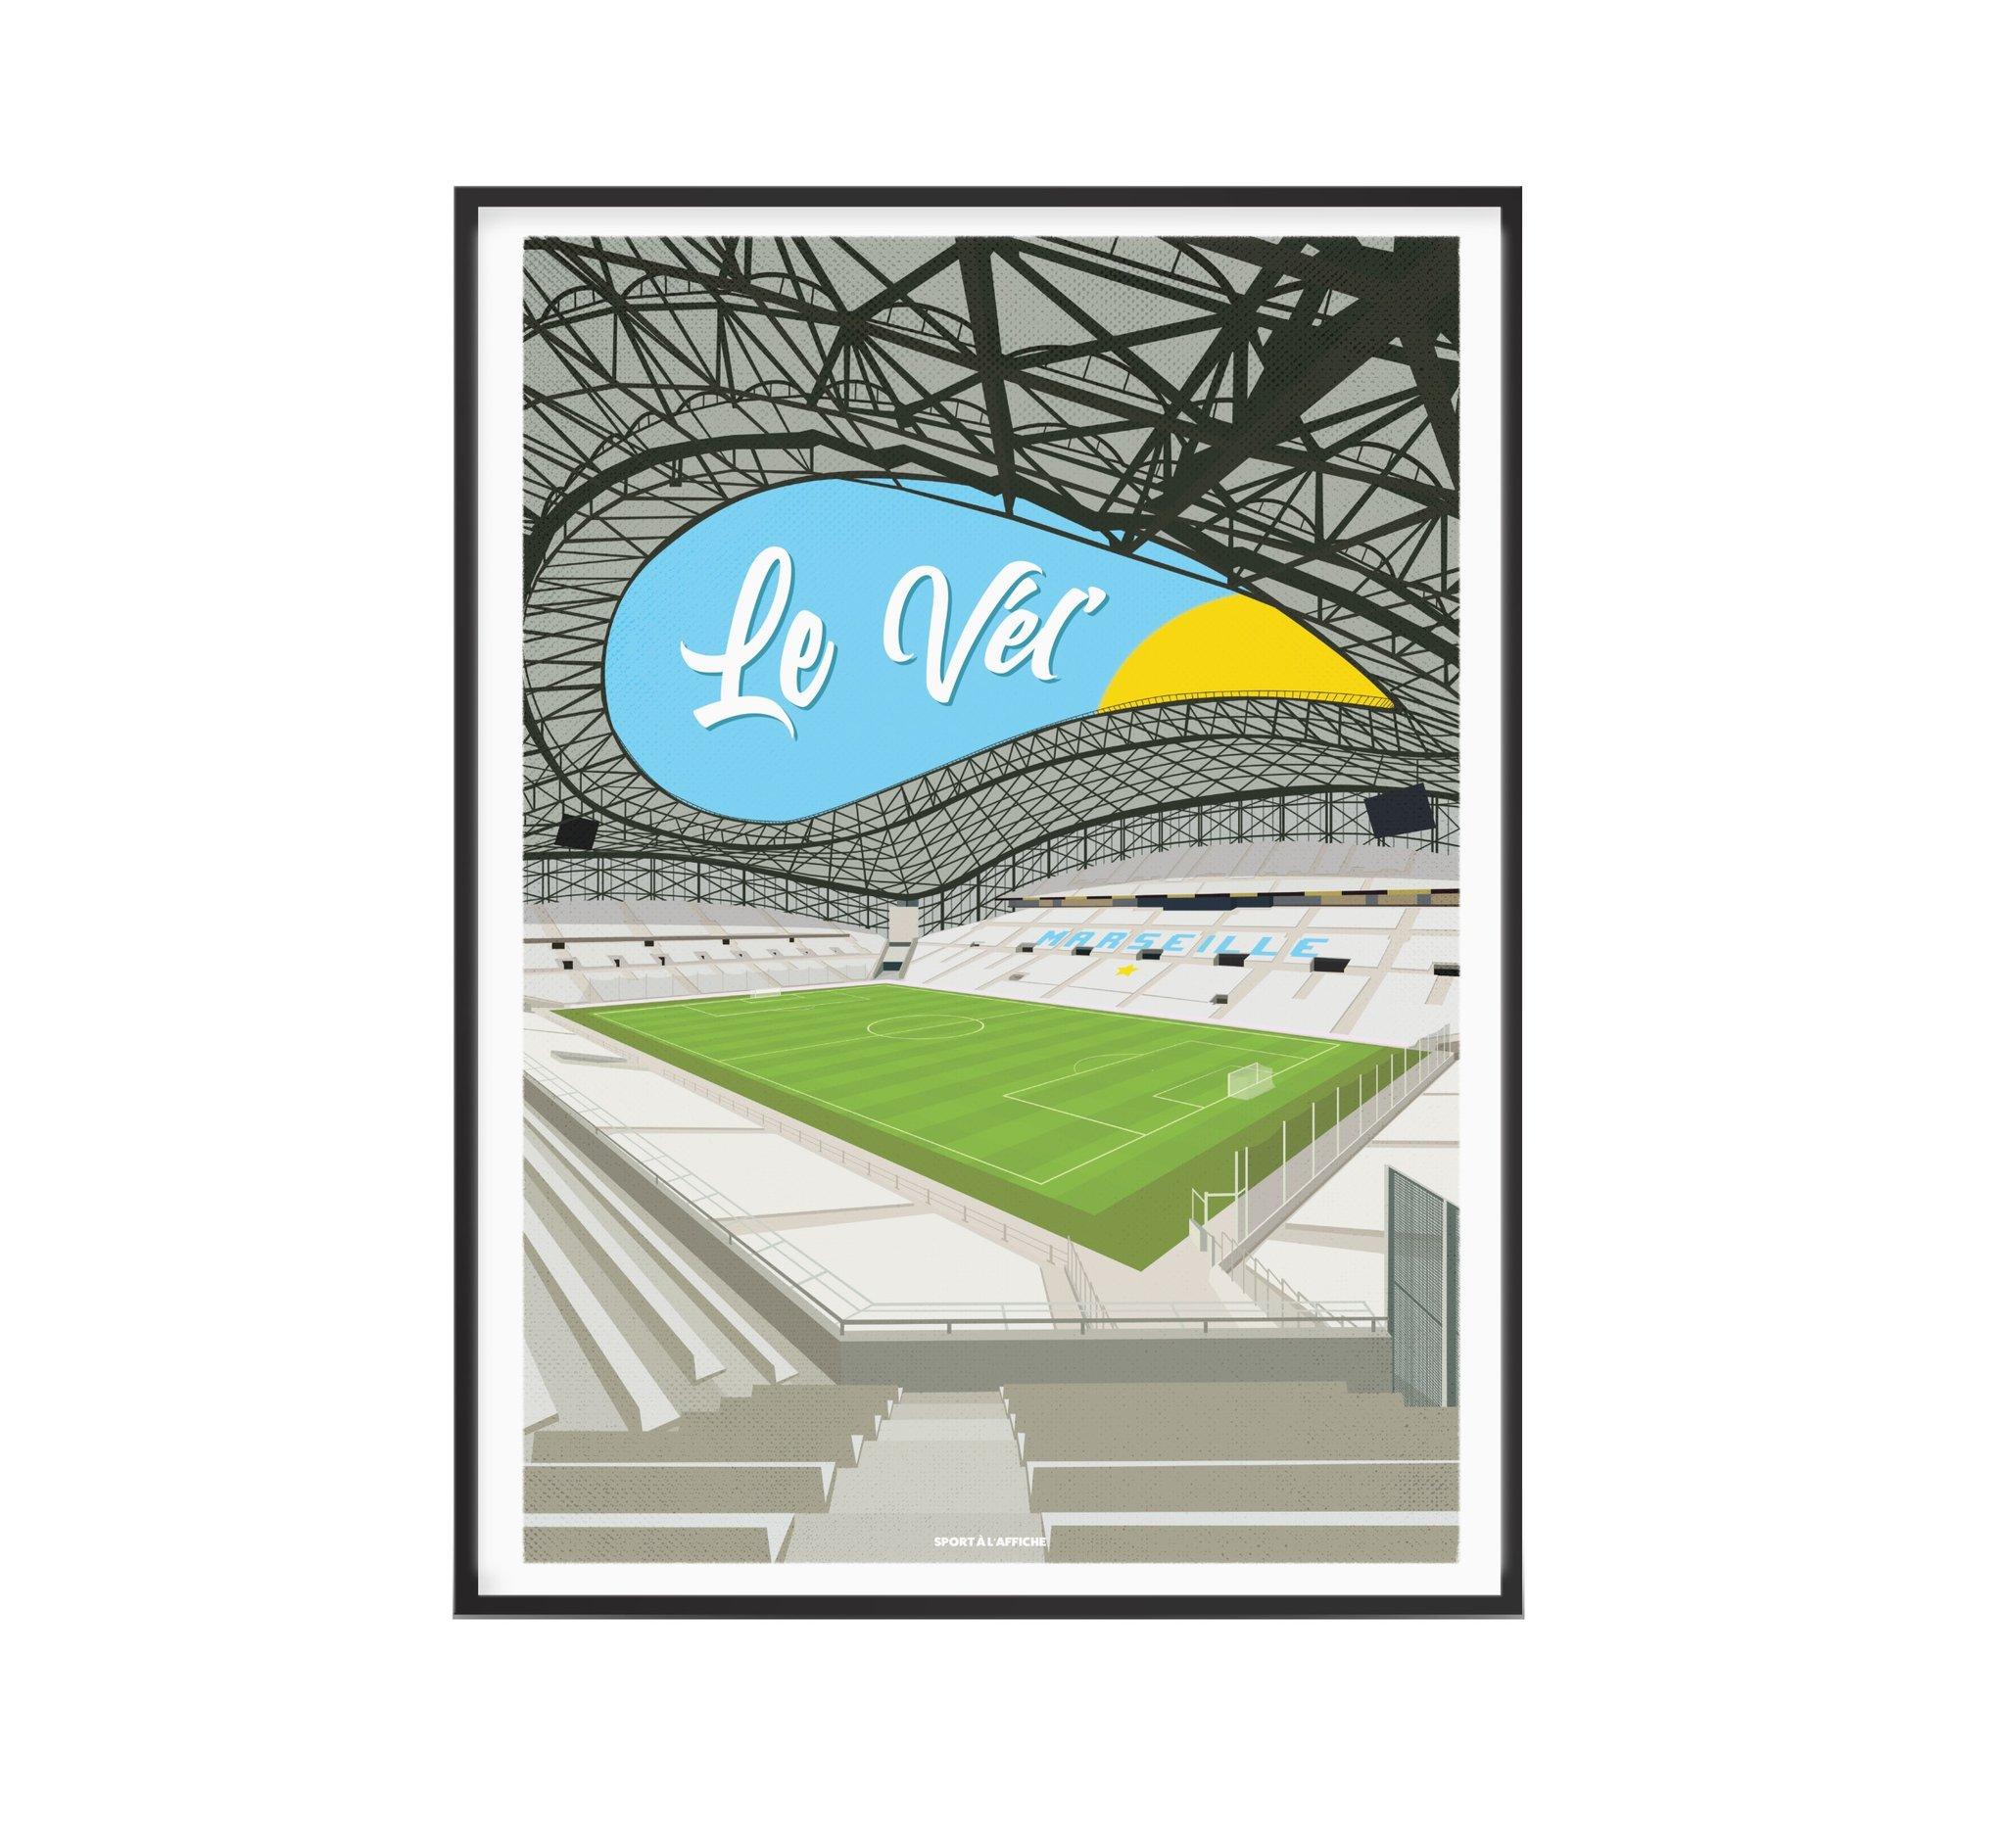 Affiche stade Vélodrome Marseille 30x40 cm